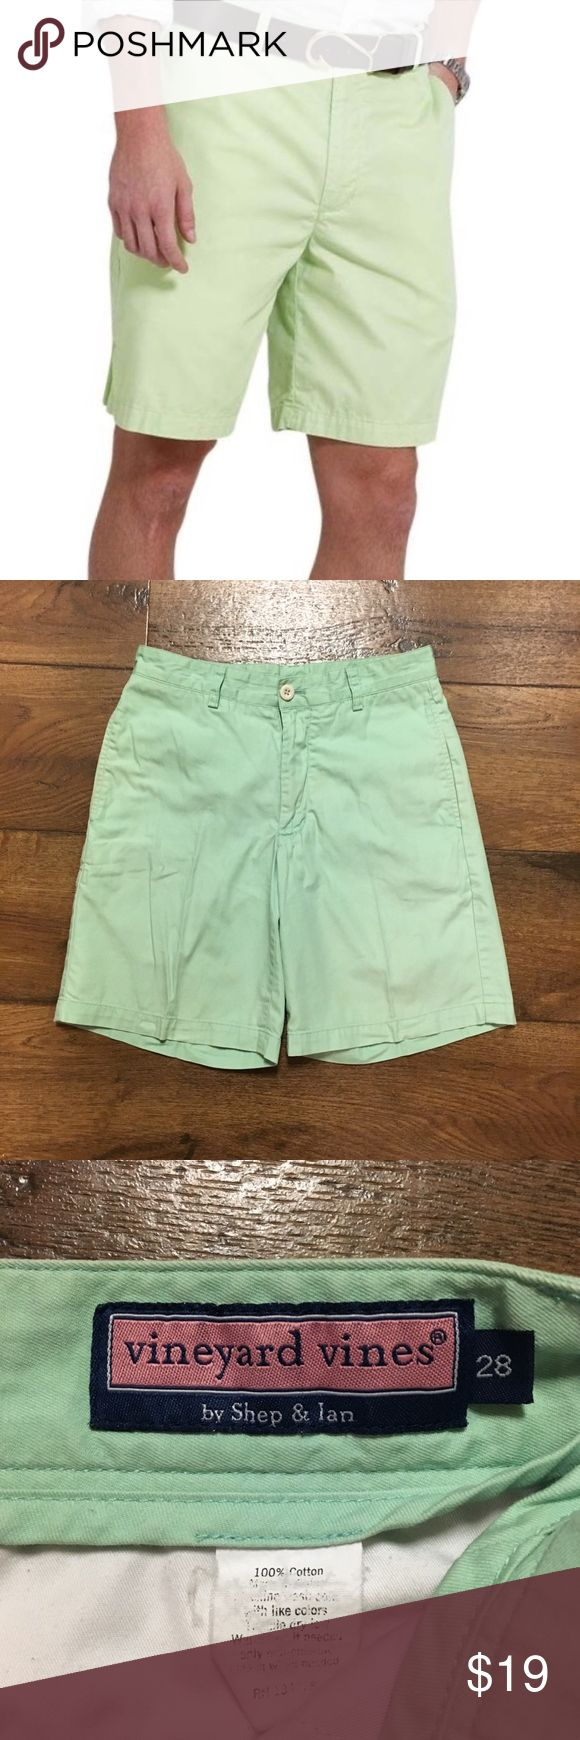 "Men's Vineyard Vine ""Club Shorts"" Men's Vineyard Vines lime green shorts in very good condition. Size 28. Vineyard Vines Shorts"